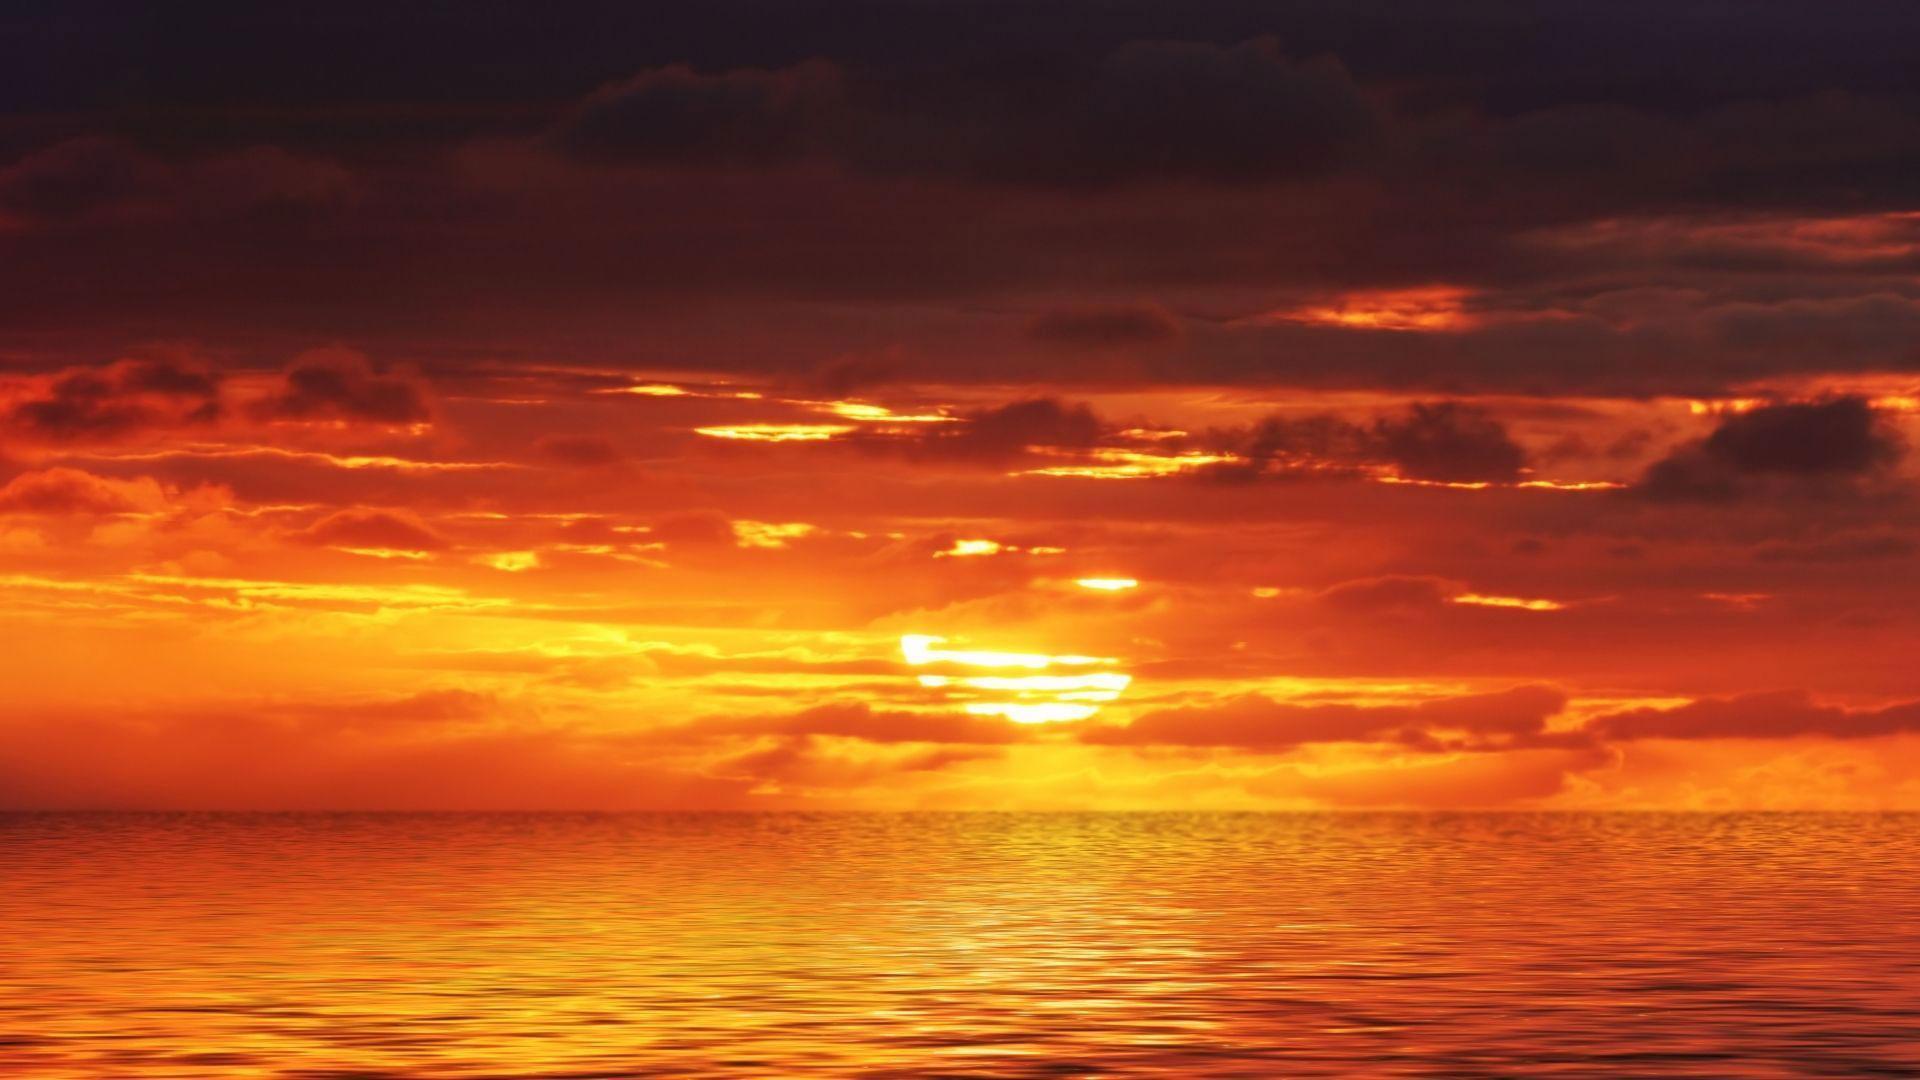 orange sky background 11 | Background Check All